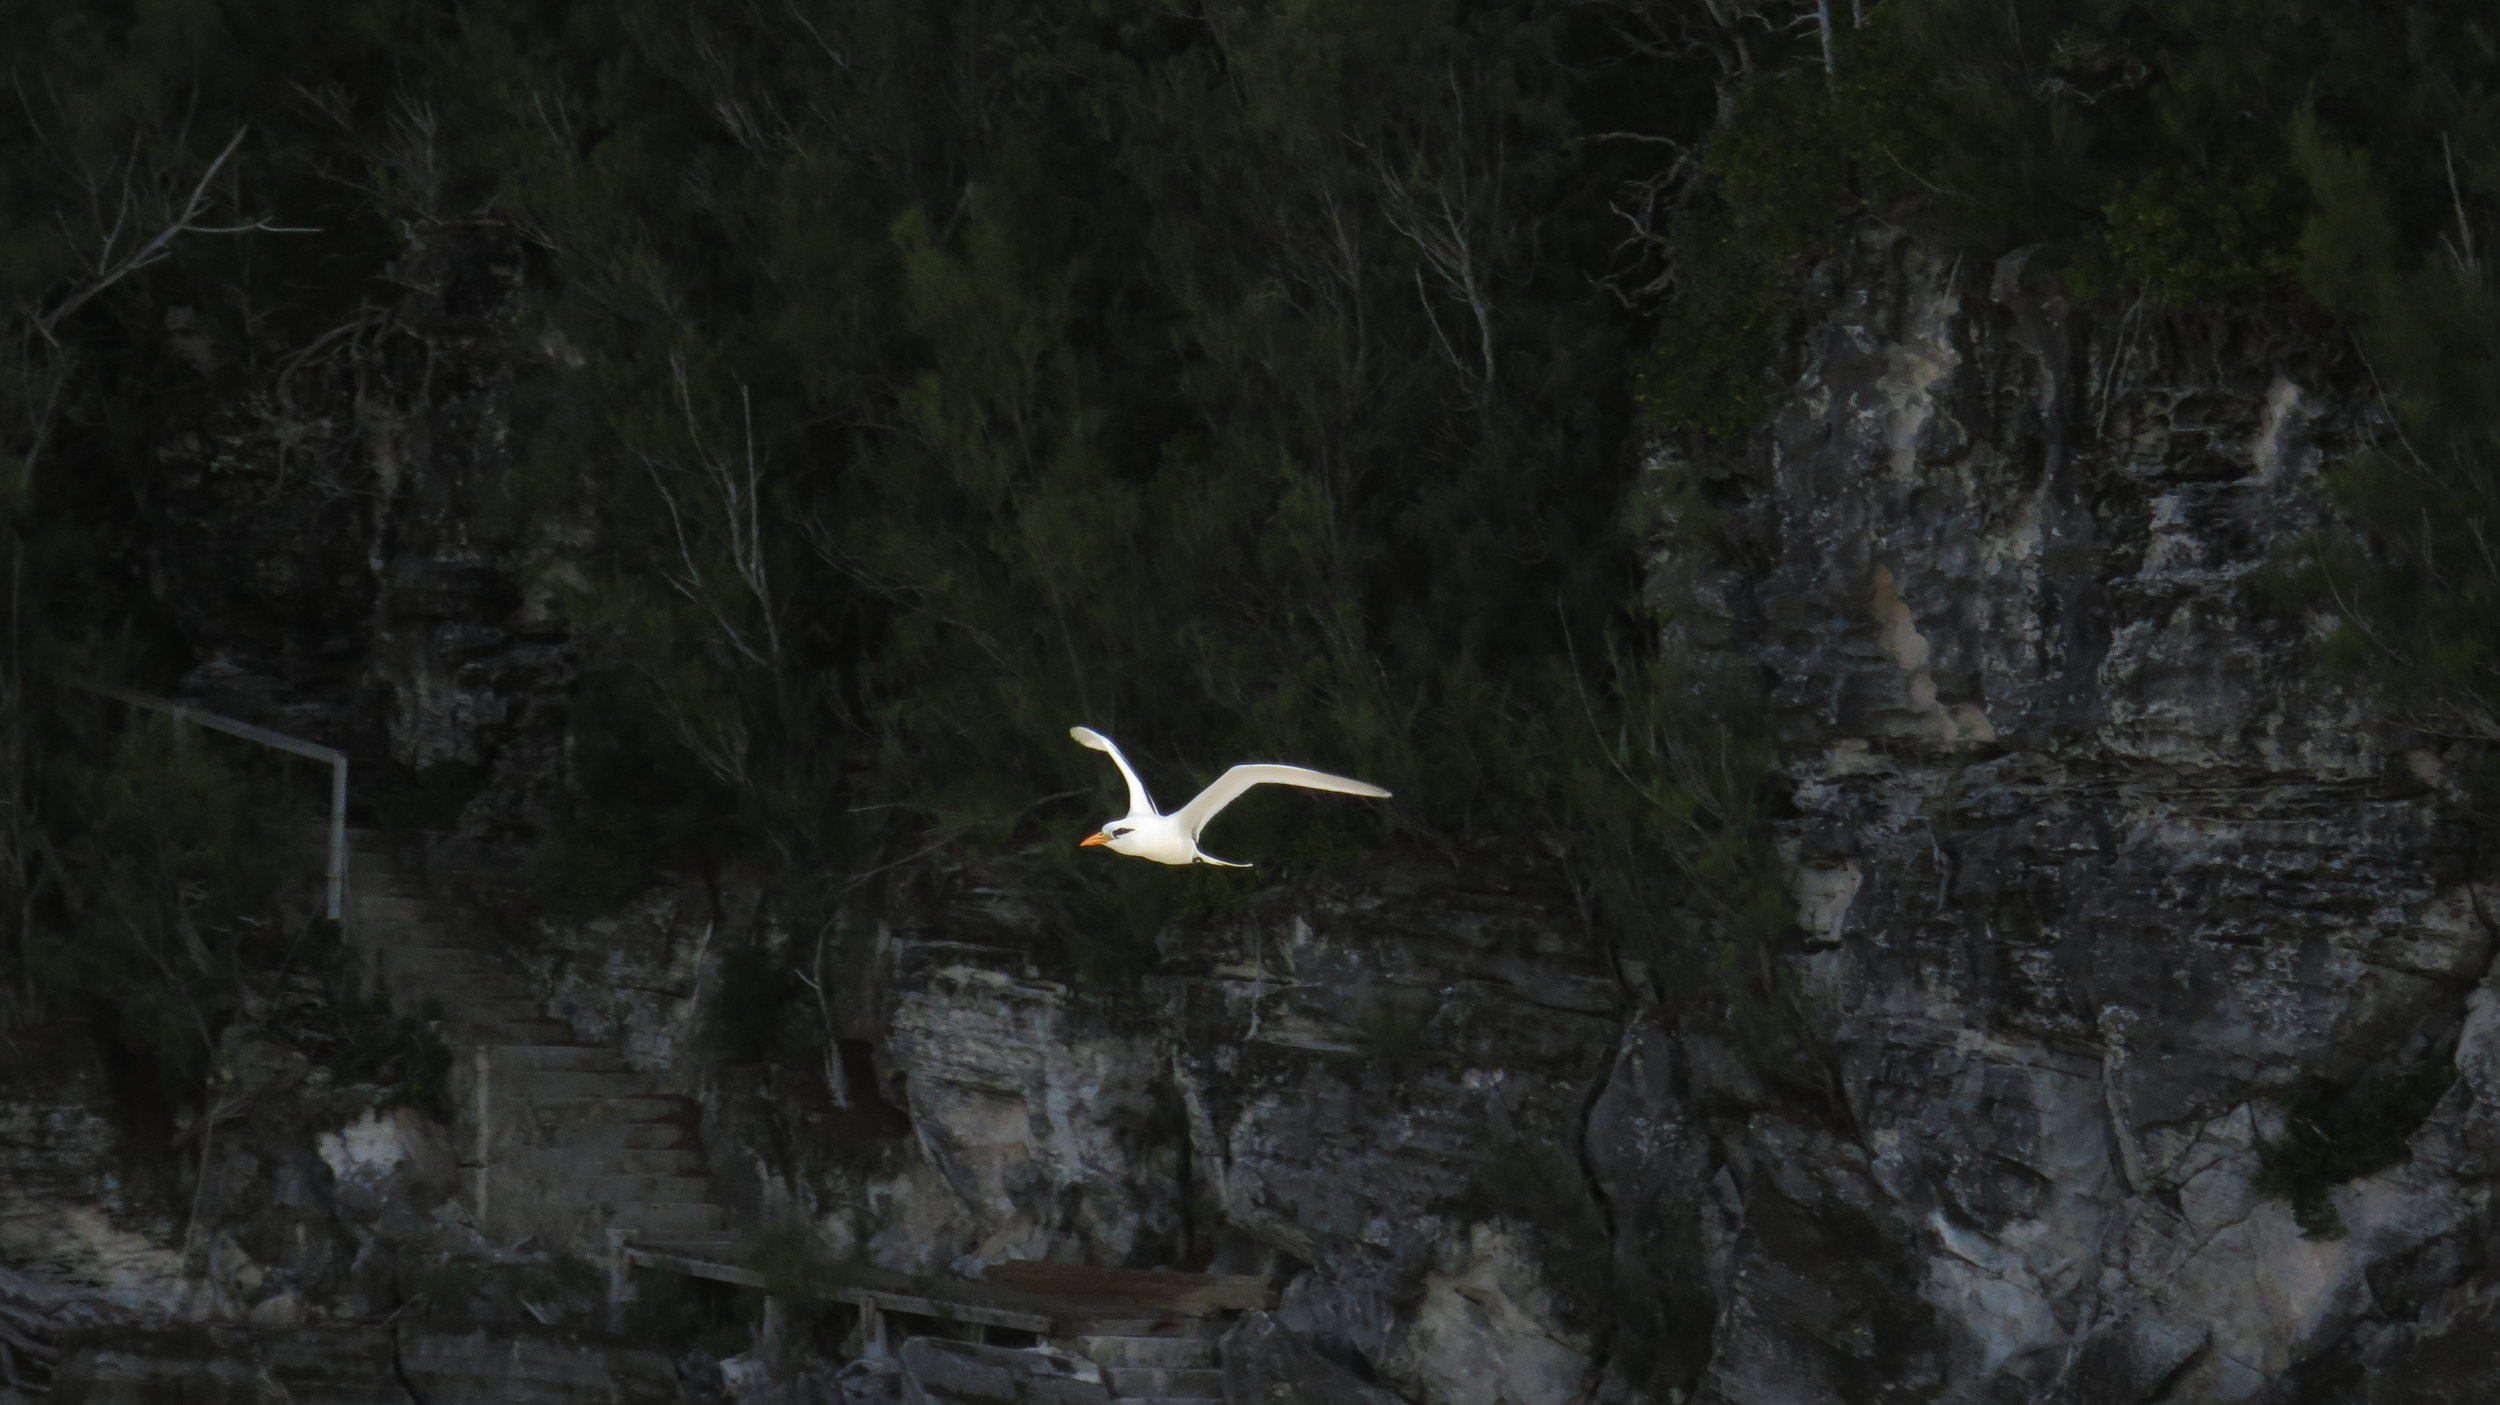 the freedom of flight © colin goedecke